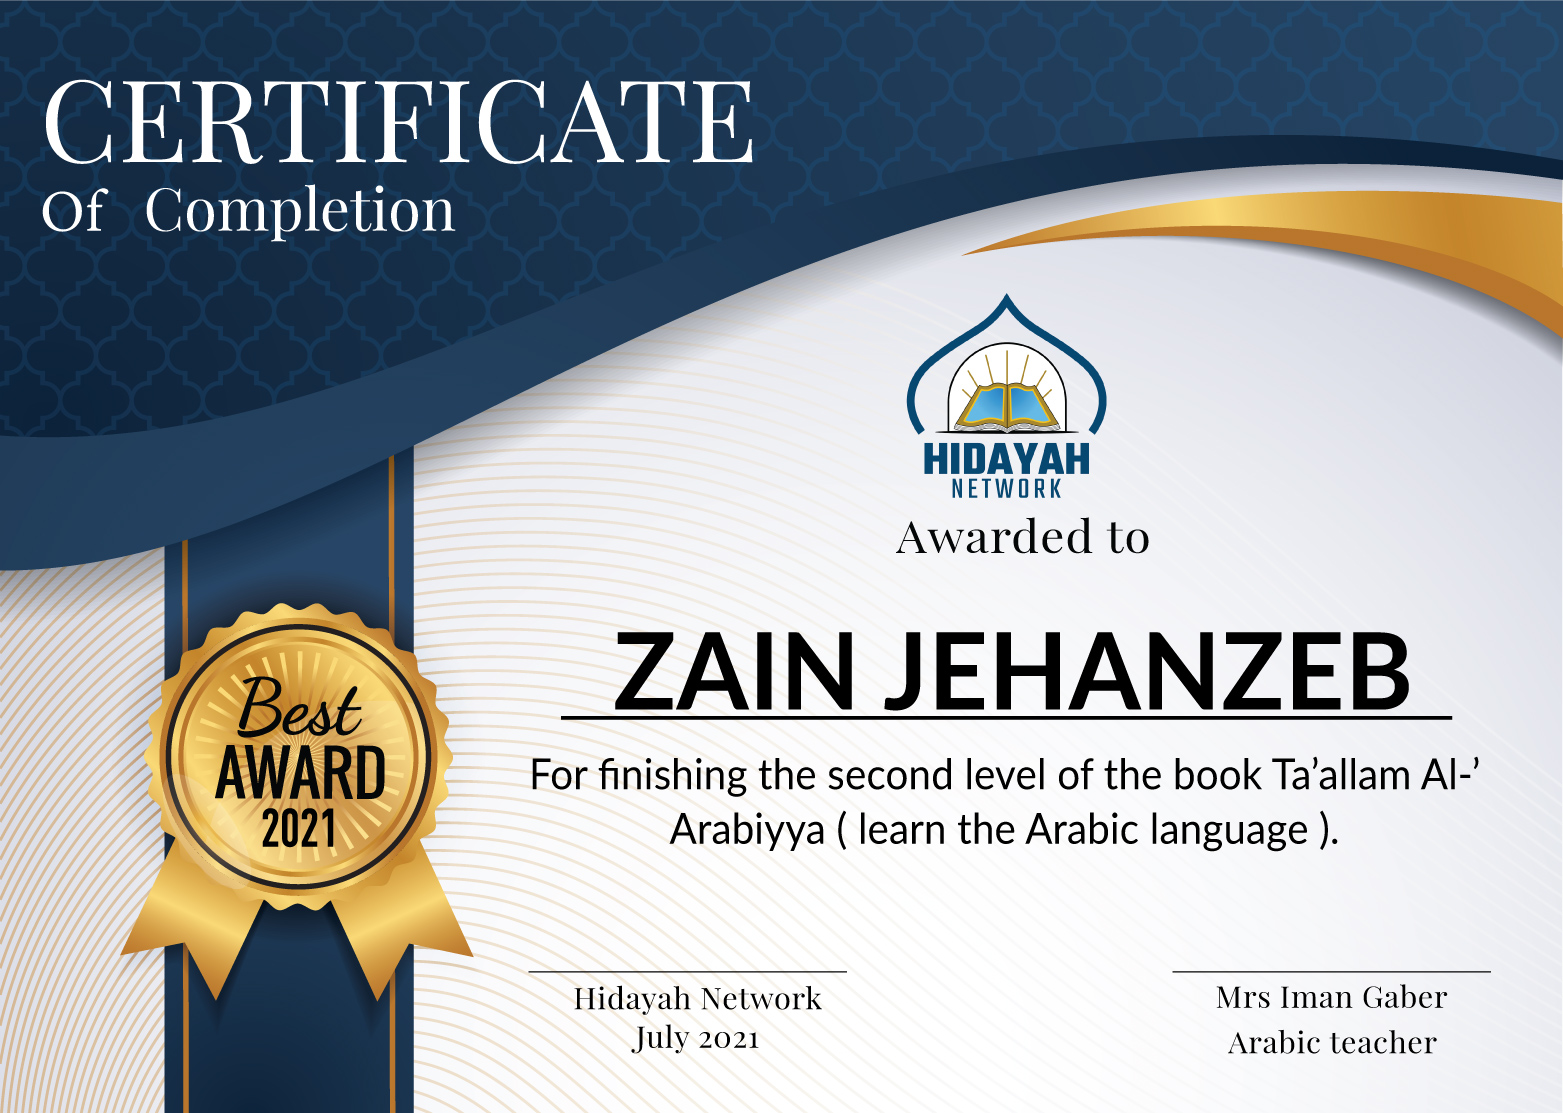 zain-jehanzeb